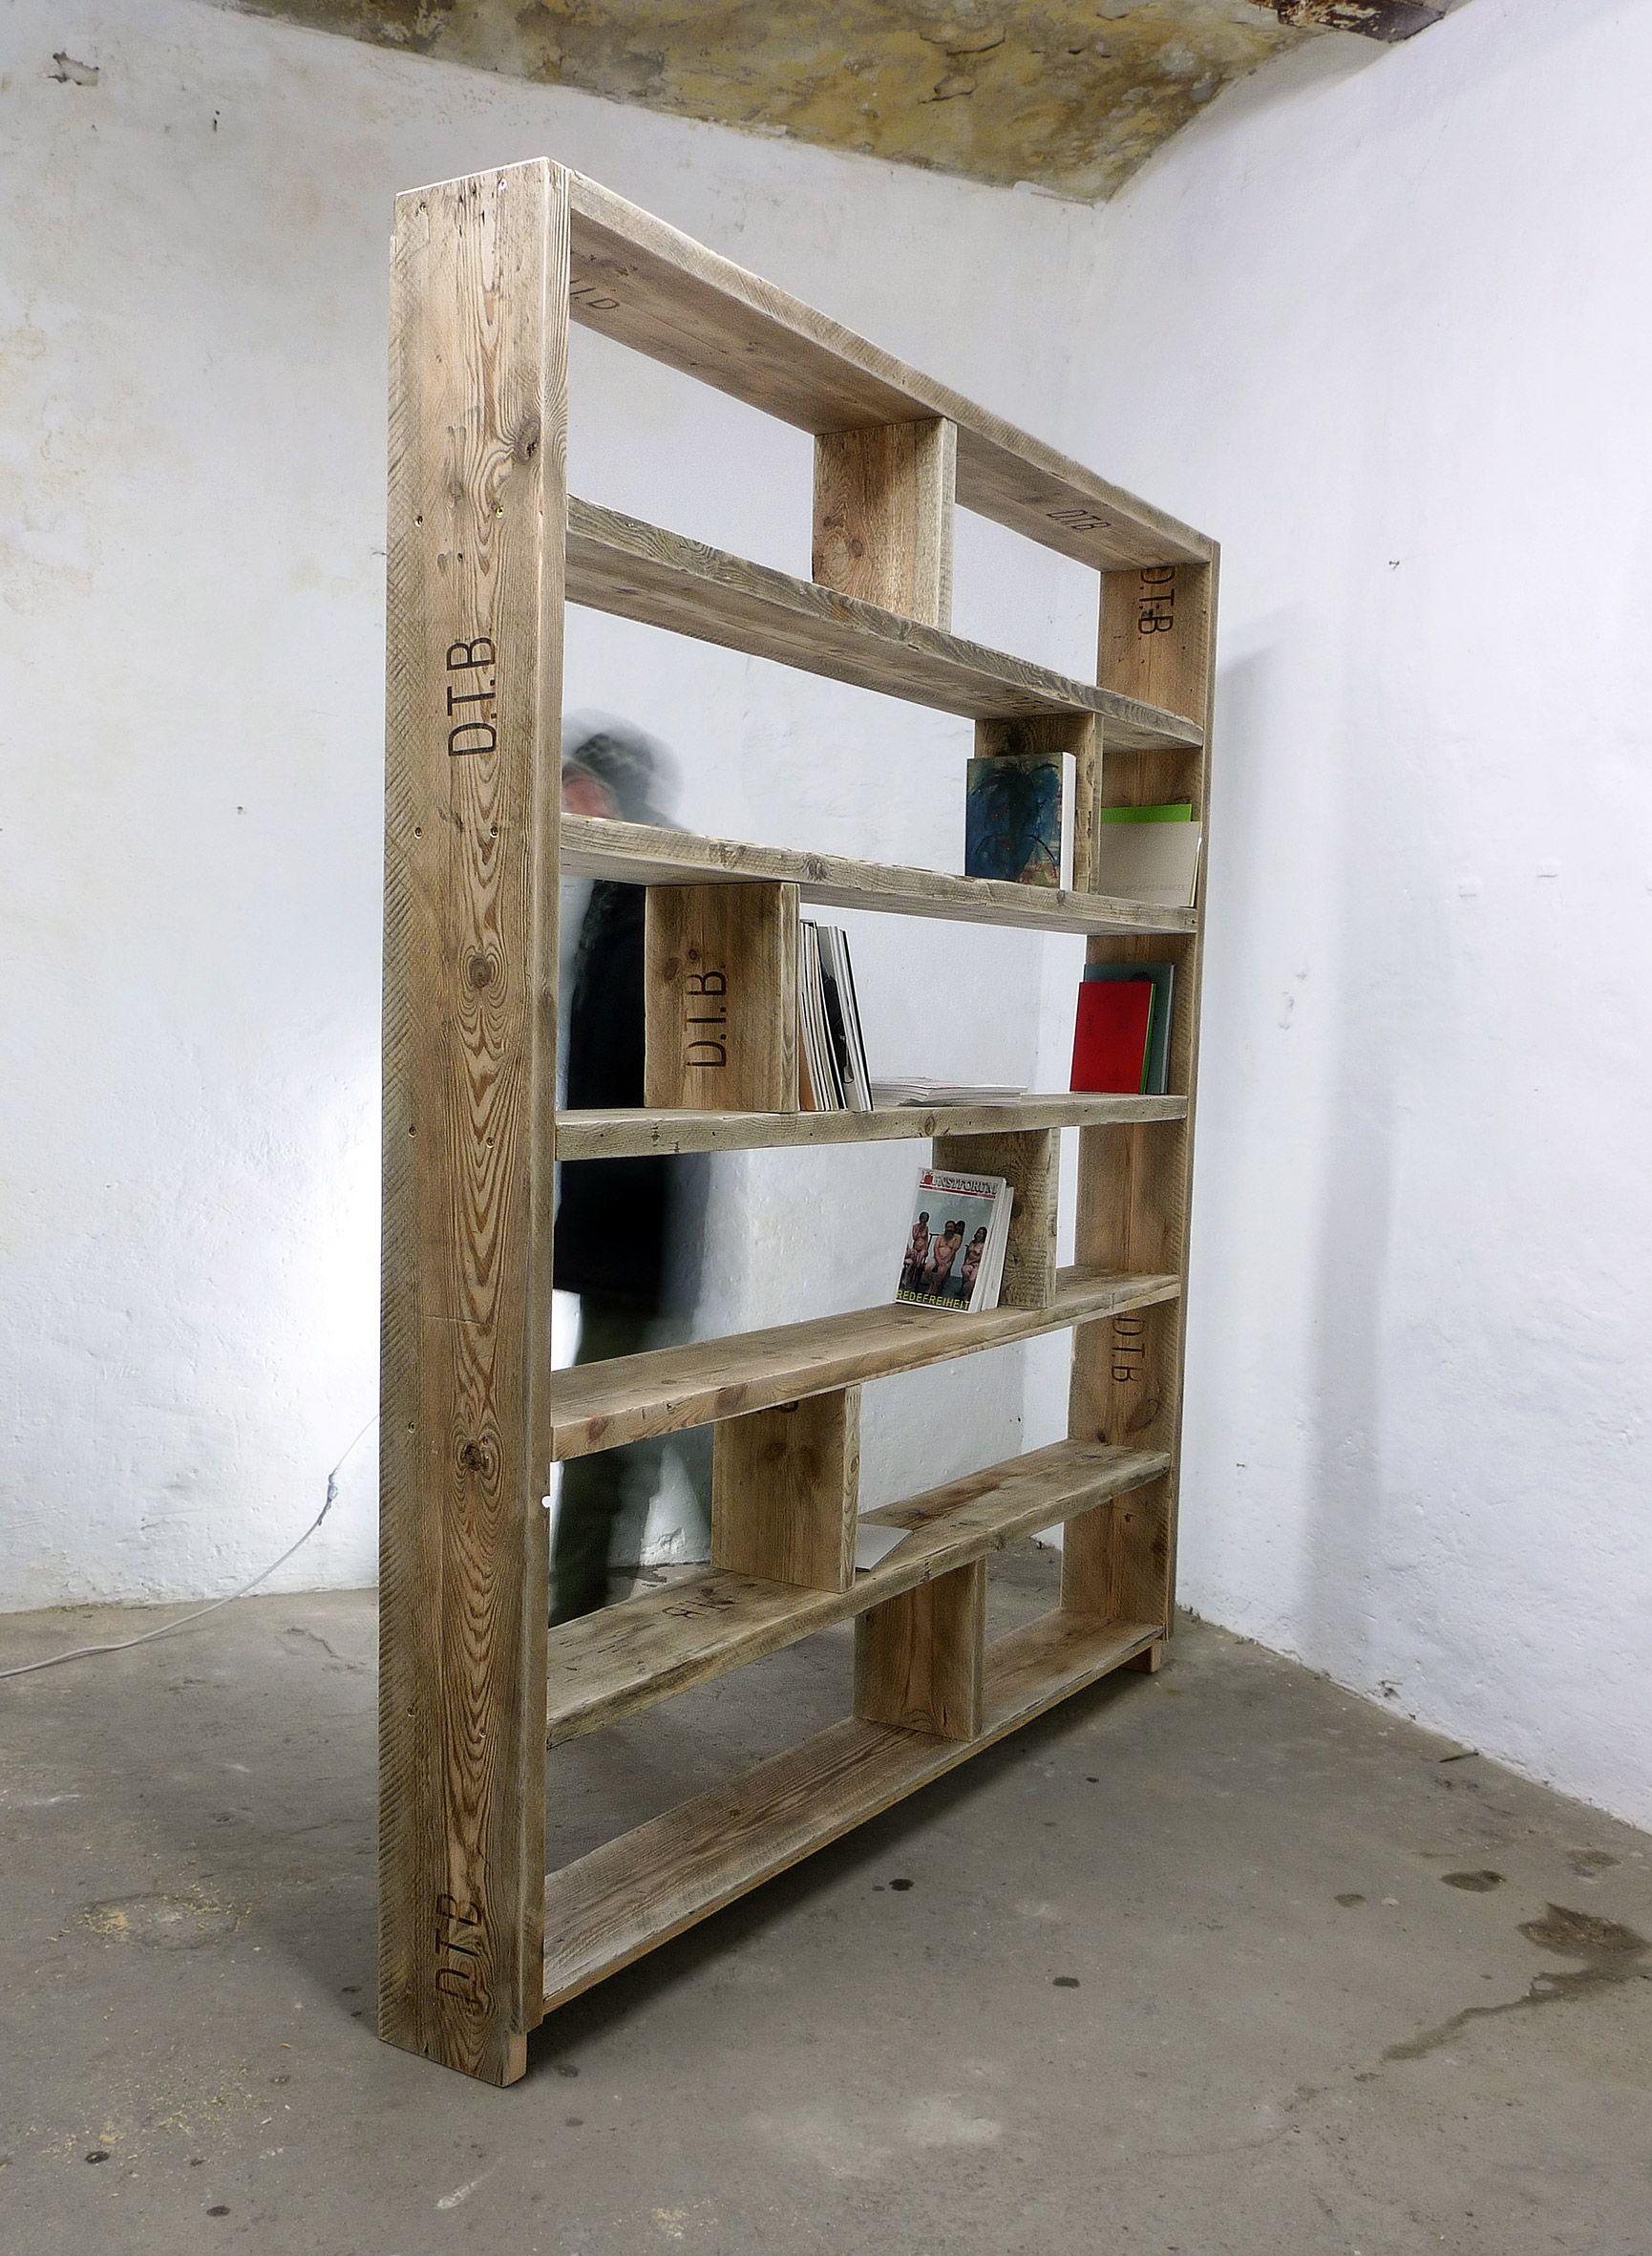 Bauholz Regal Nach Mass Bucherregal Sideboard Made In Berlin Bauen Mit Holz Bucherregal Selber Bauen Mobel